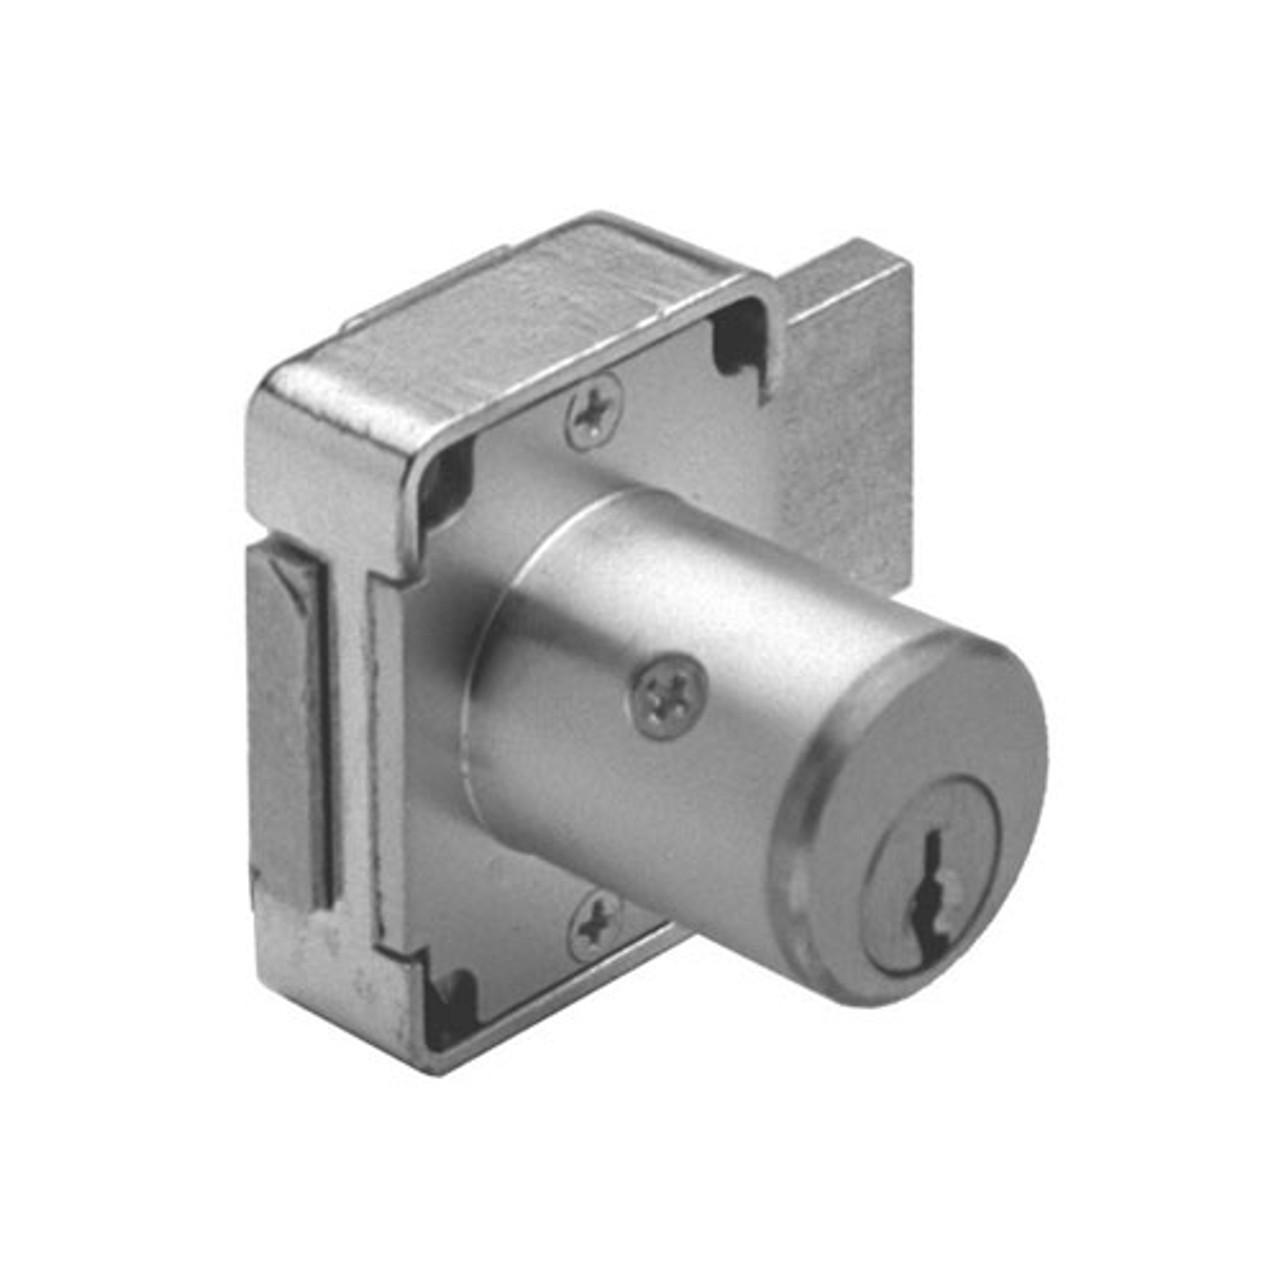 Olympus 100DR-KA101-26D-7/8 Deadbolt Locks in Satin Chrome Finish